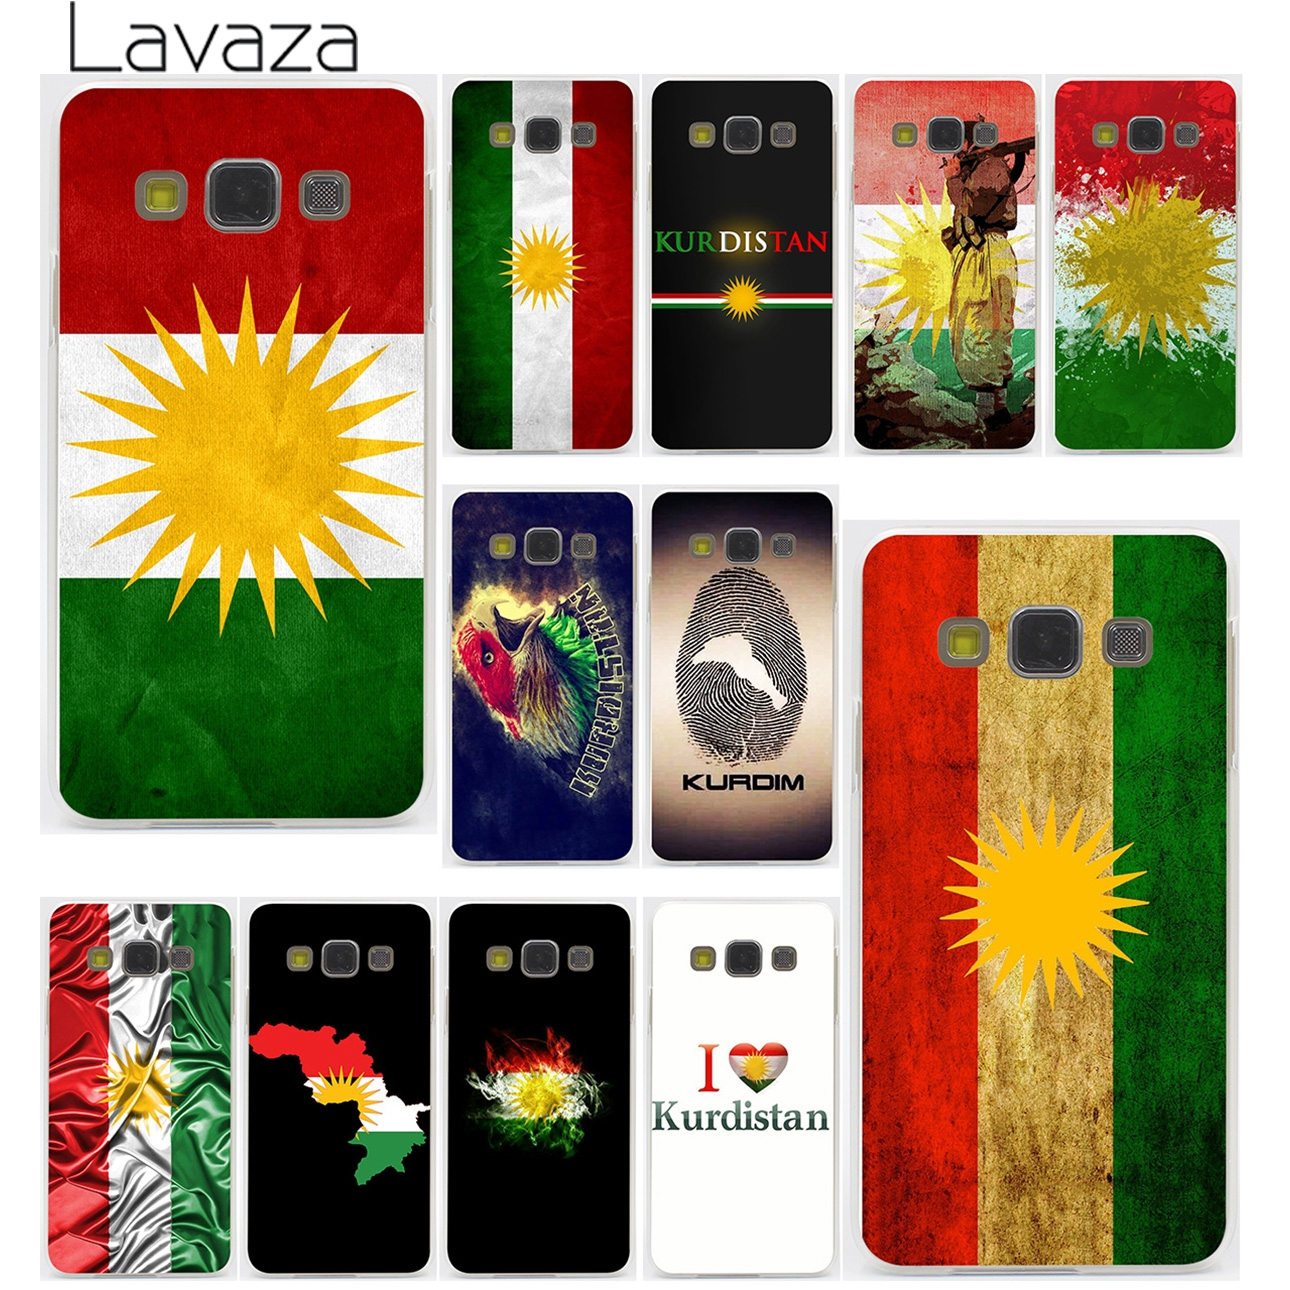 Lavaza Kurdish Autonomous Region flag Hard Case for Samsung Galaxy S3 S4 S5 & Mini S6 S7 Edge S6 S8 S9 Edge Plus